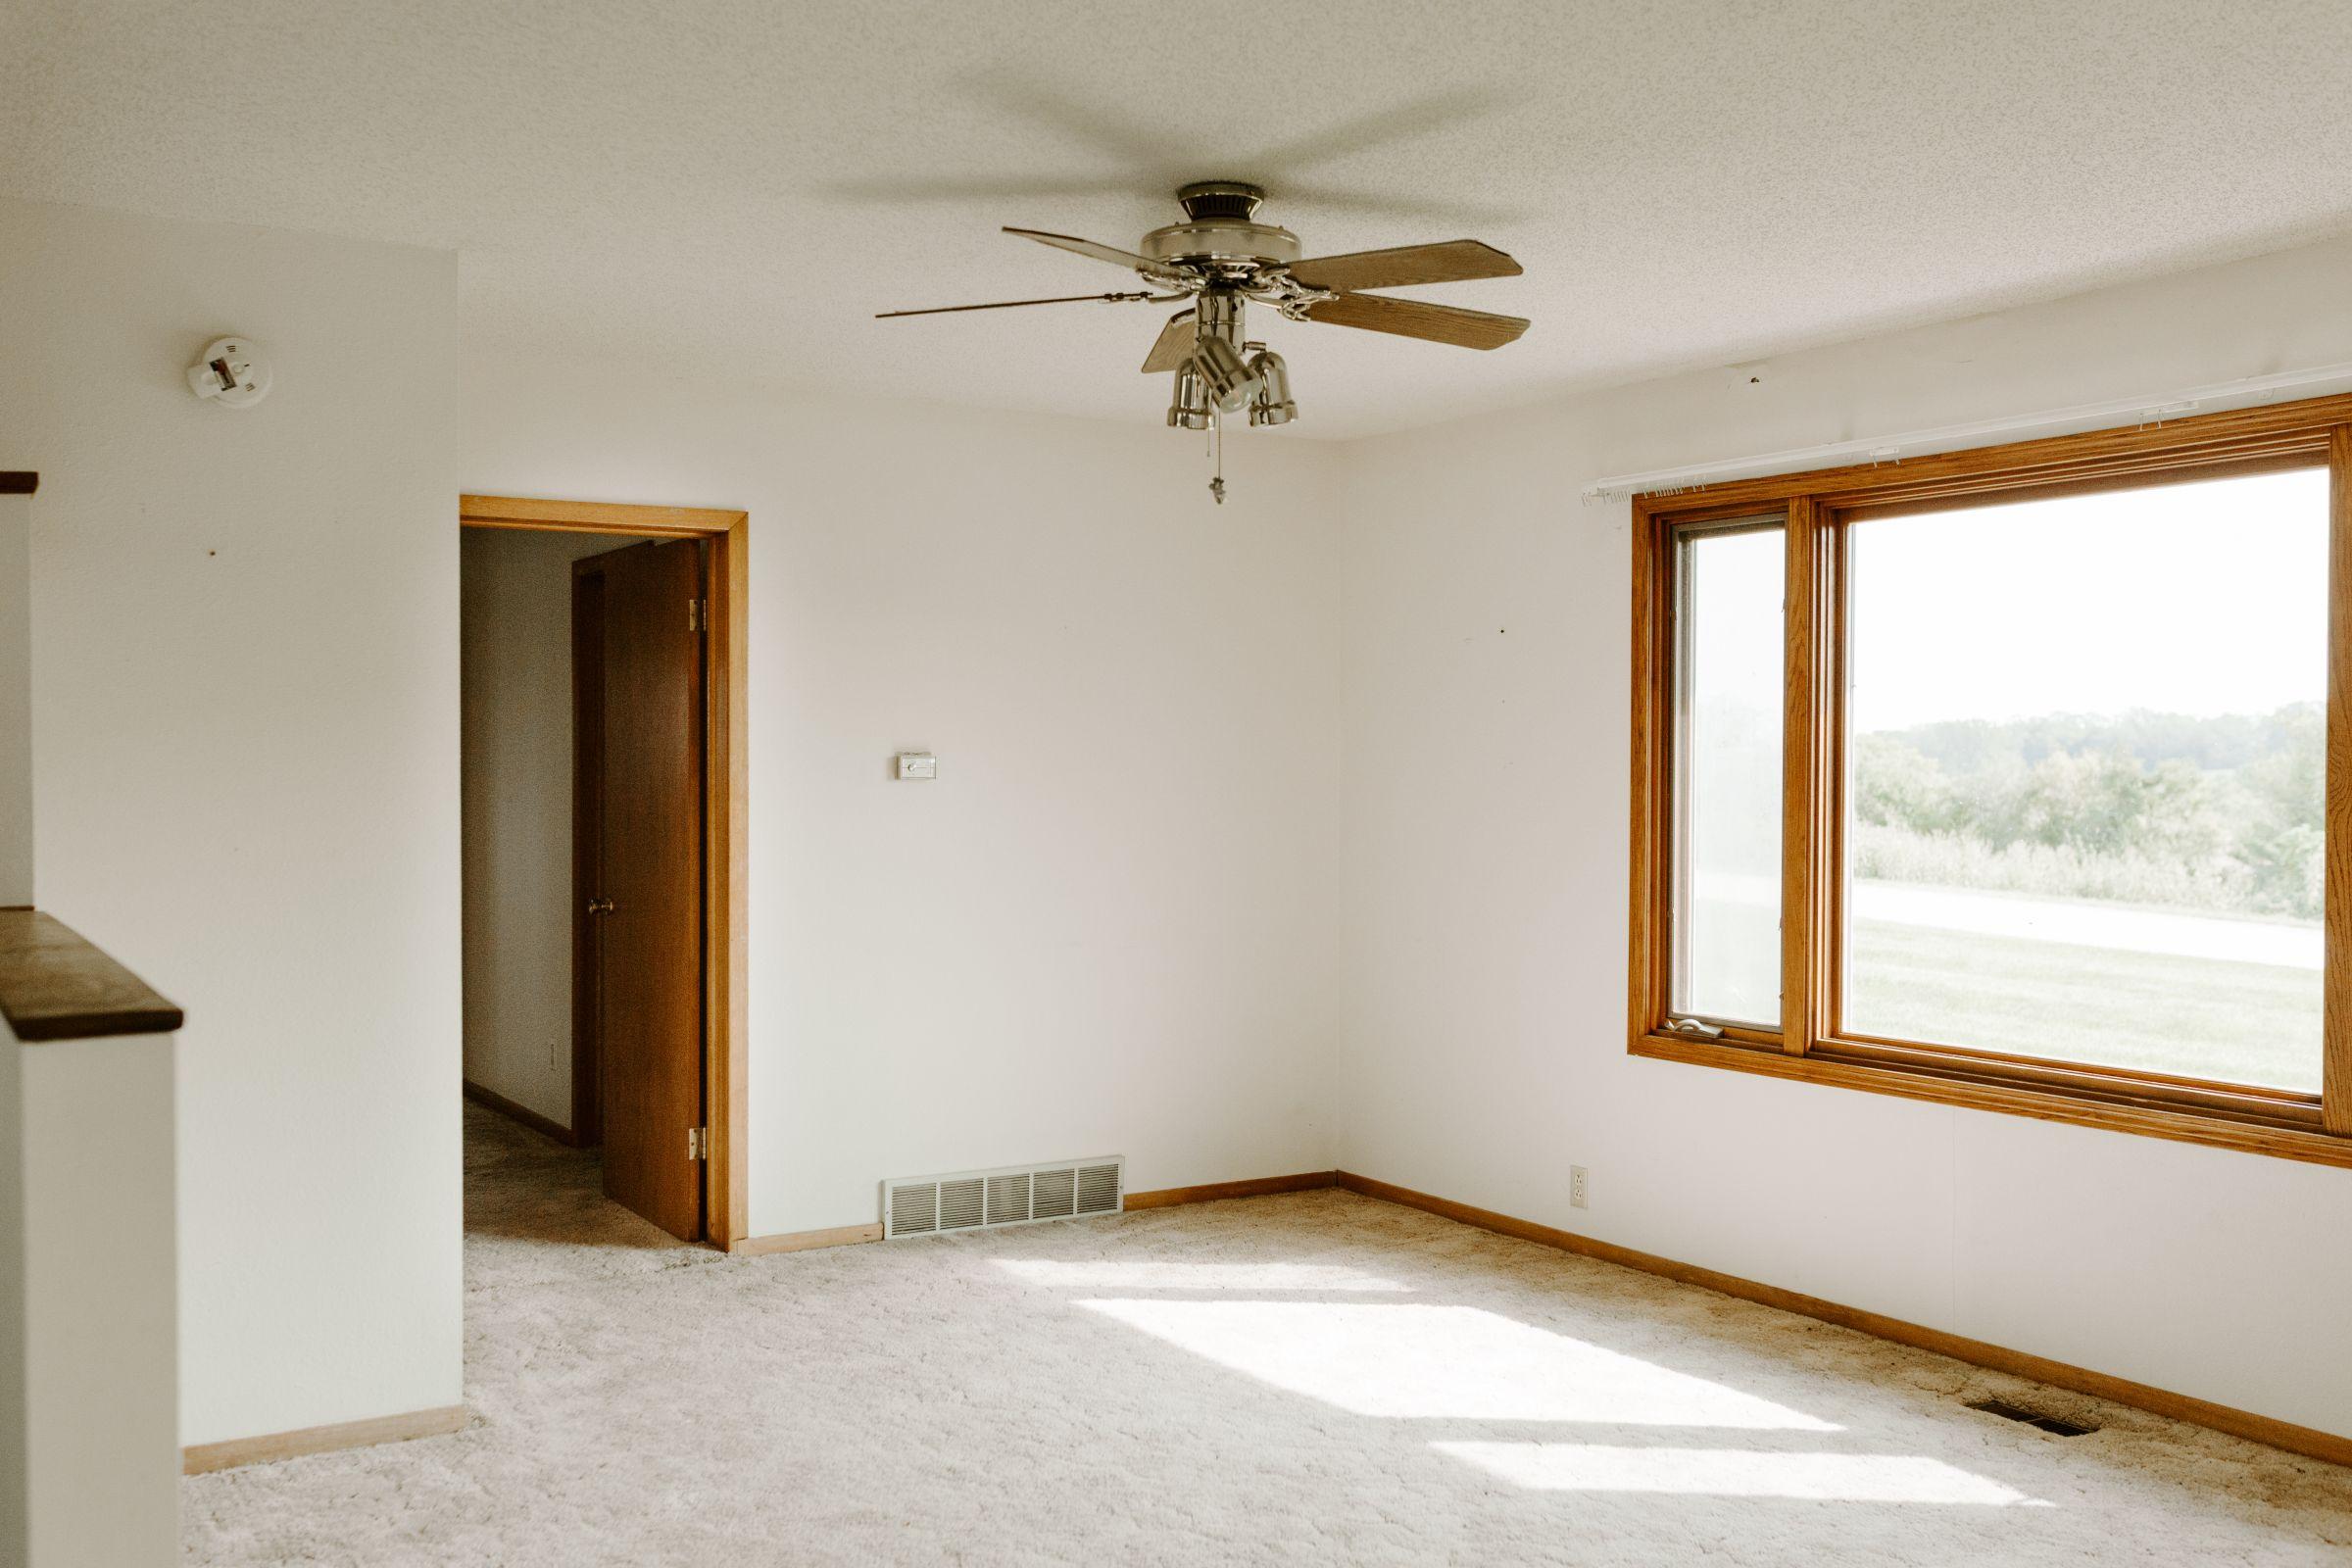 residential-warren-county-iowa-2-acres-listing-number-15743-4-2021-09-15-193736.jpg